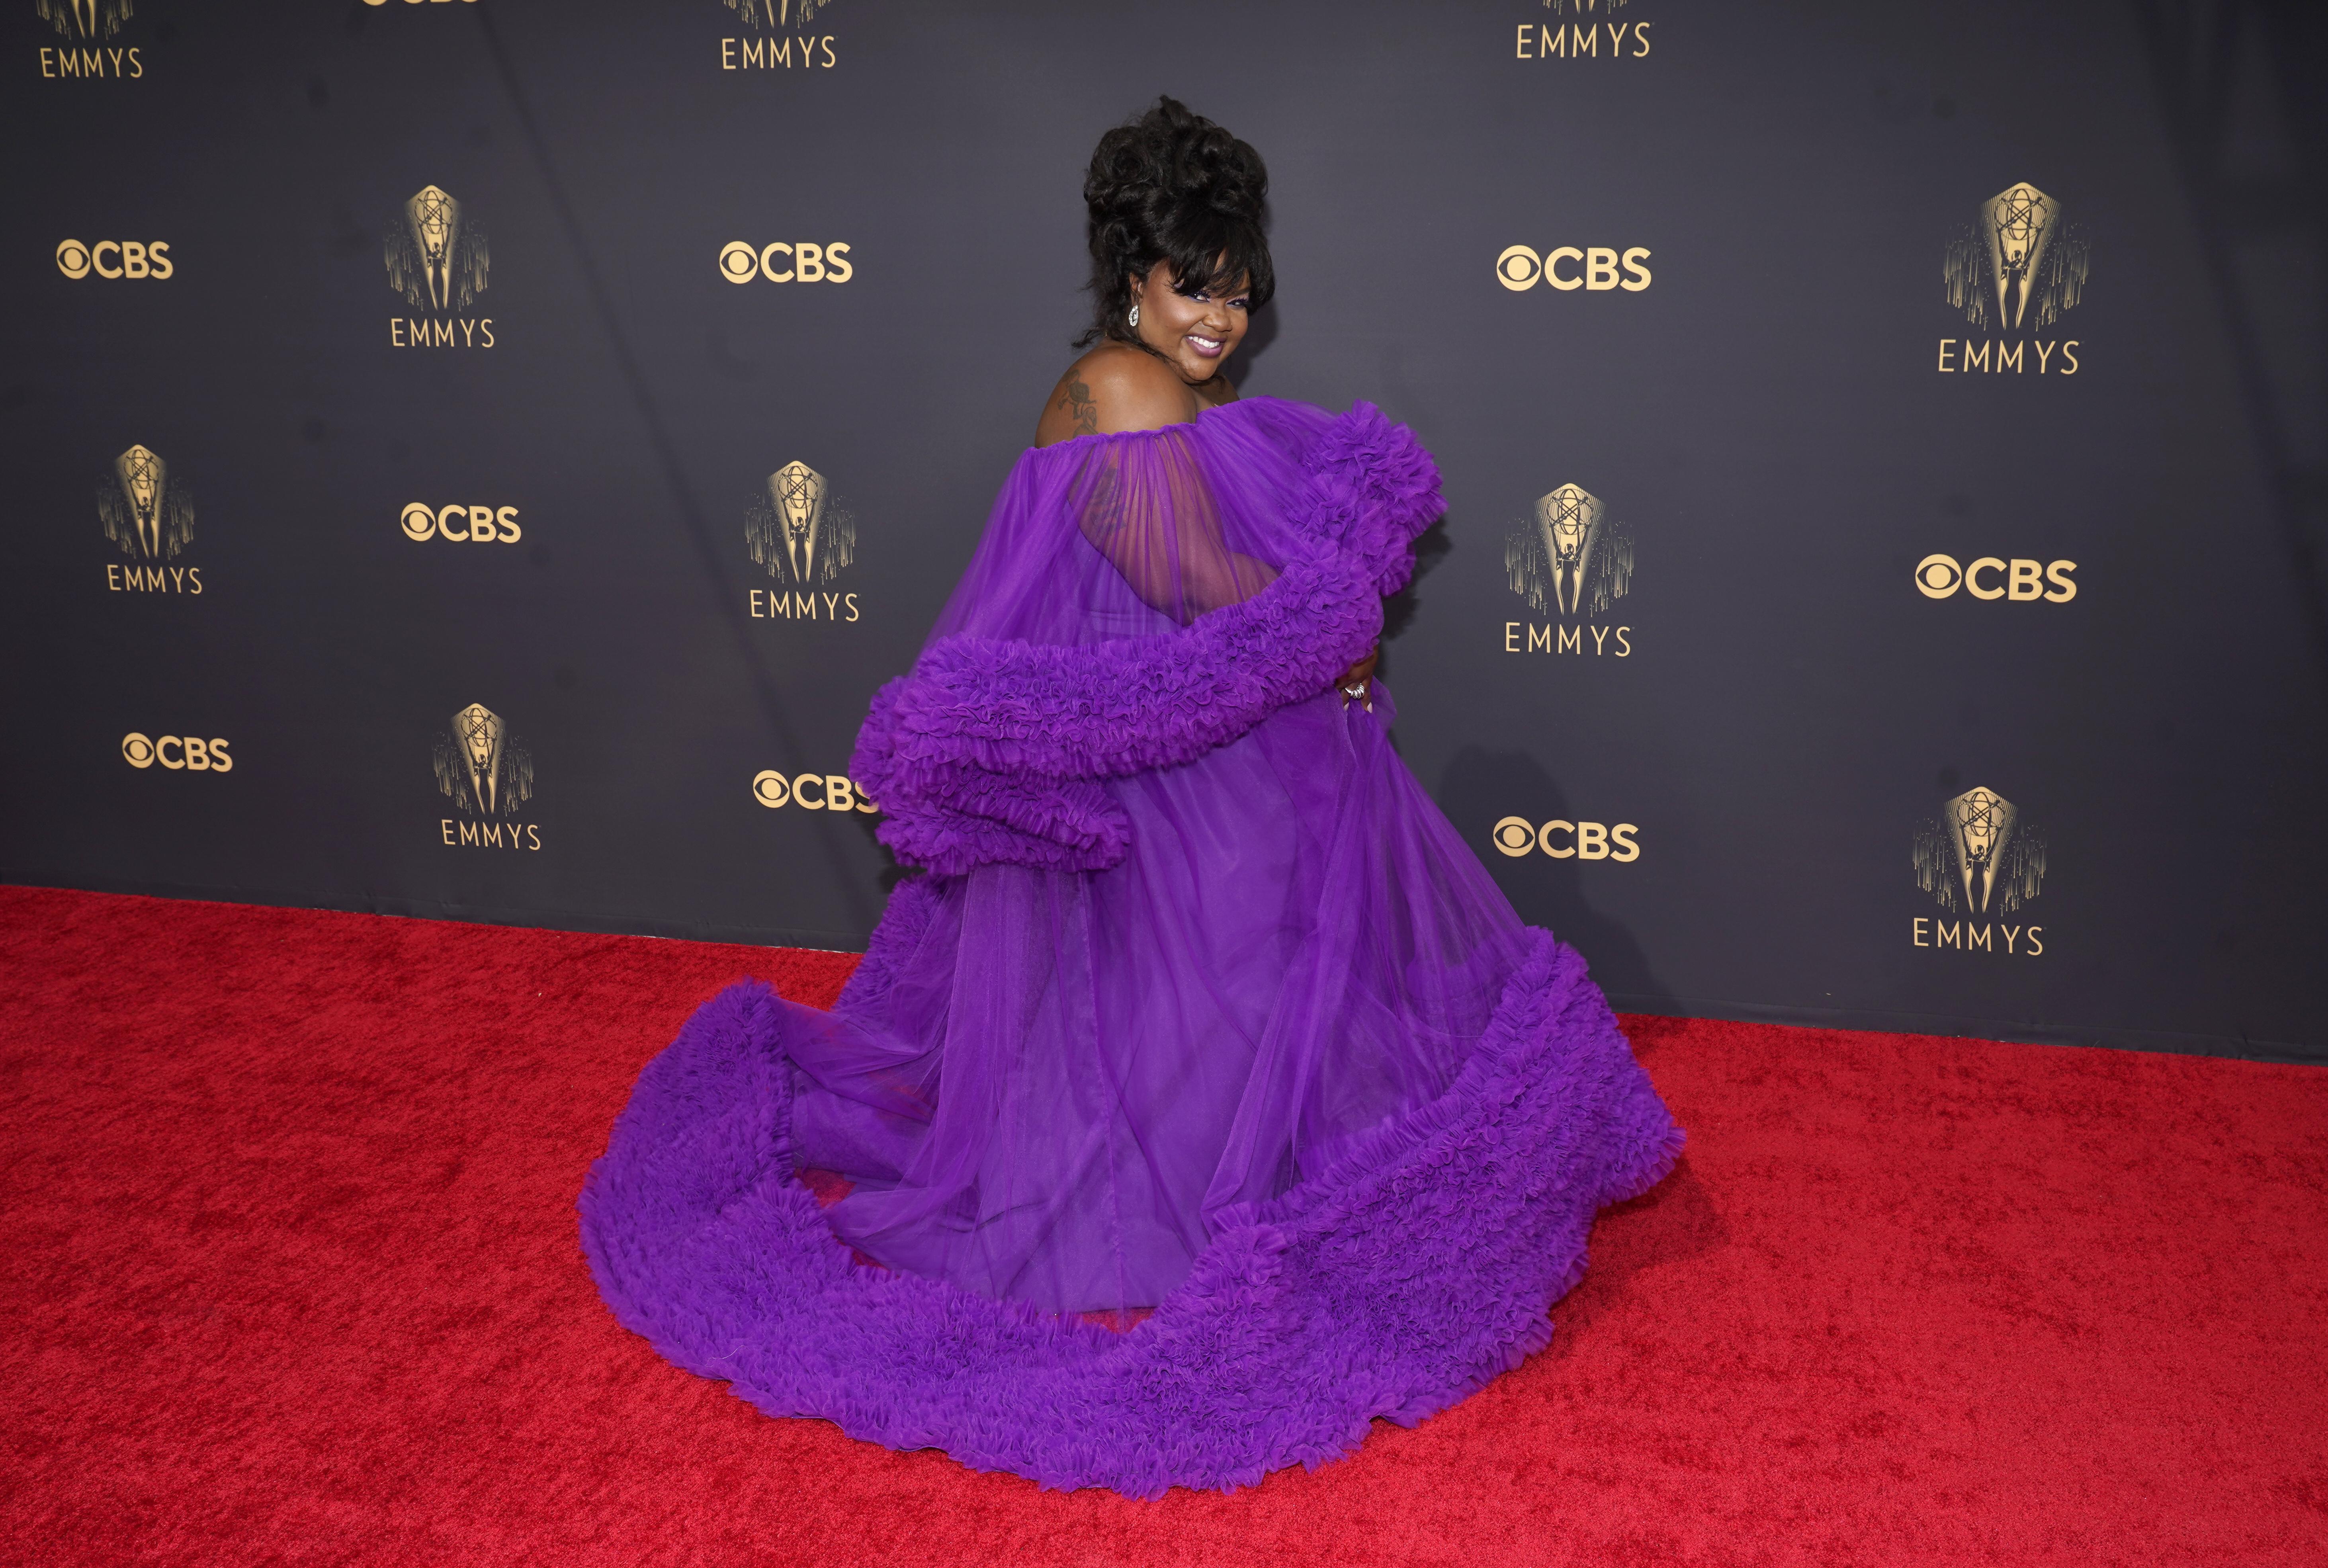 Nicole Byer arrives at the 73rd Primetime Emmy Awards